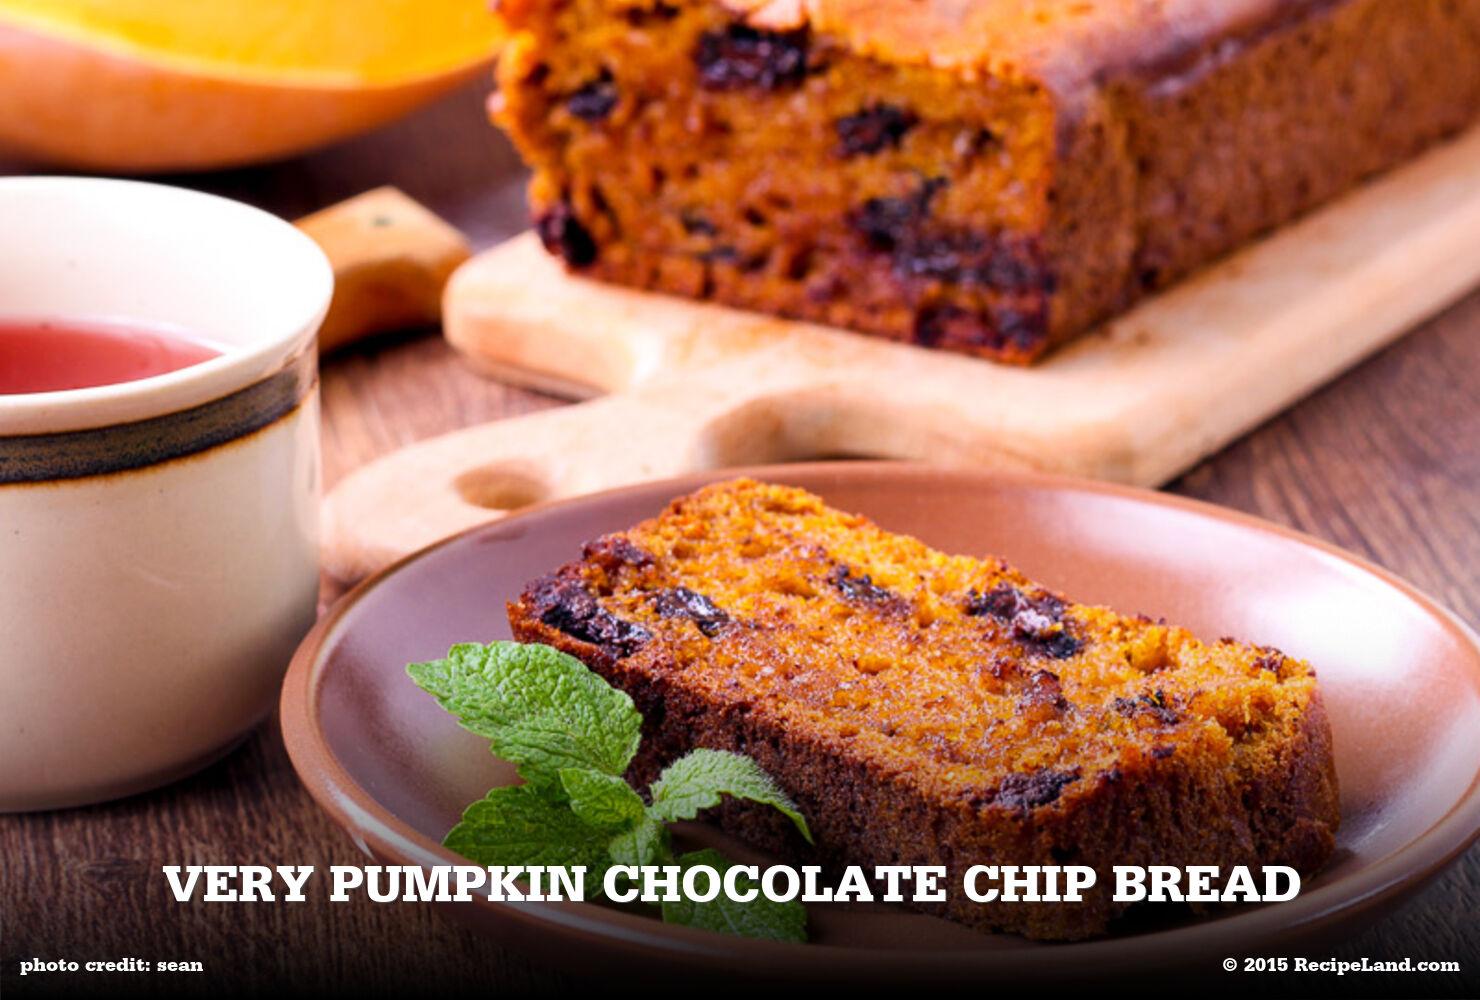 Very Pumpkin Chocolate Chip Bread